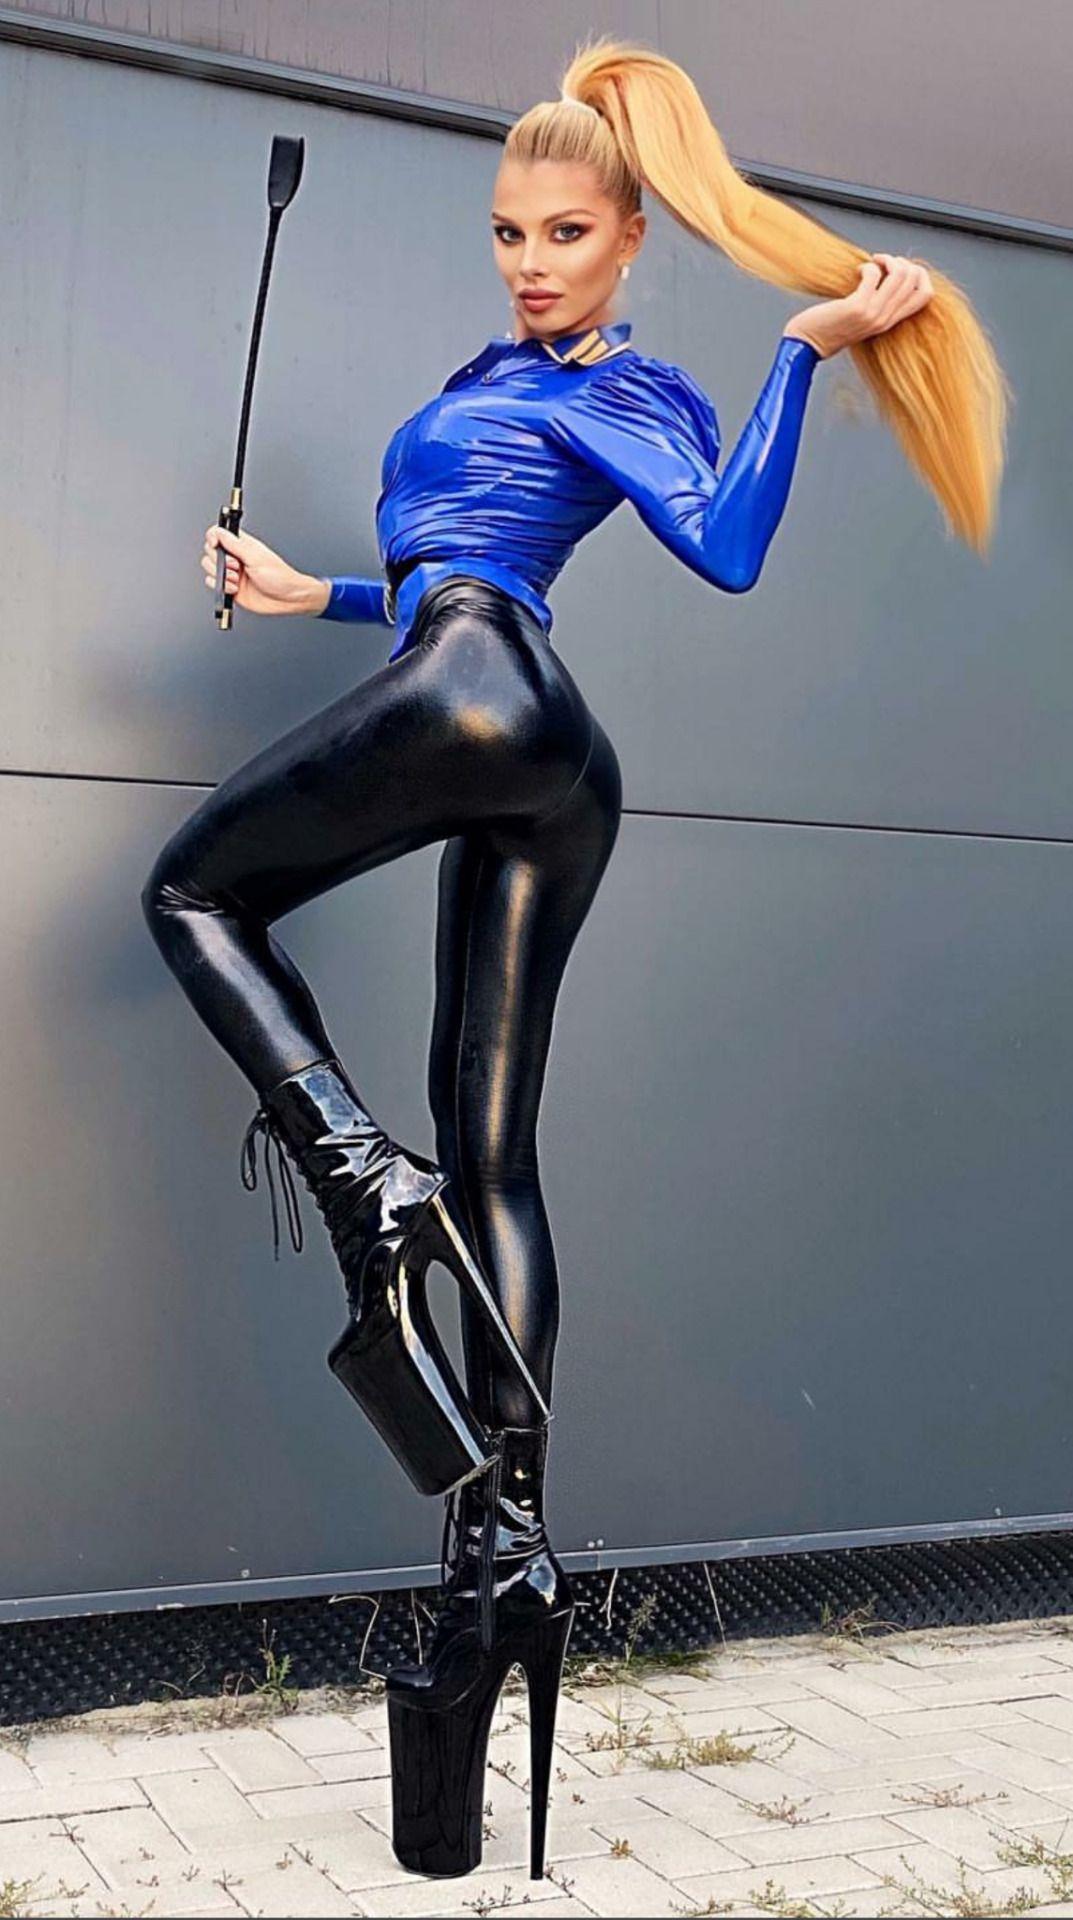 👑Goddess in Boots&Heels 👑 | Heiße outfits, Mädchen stil